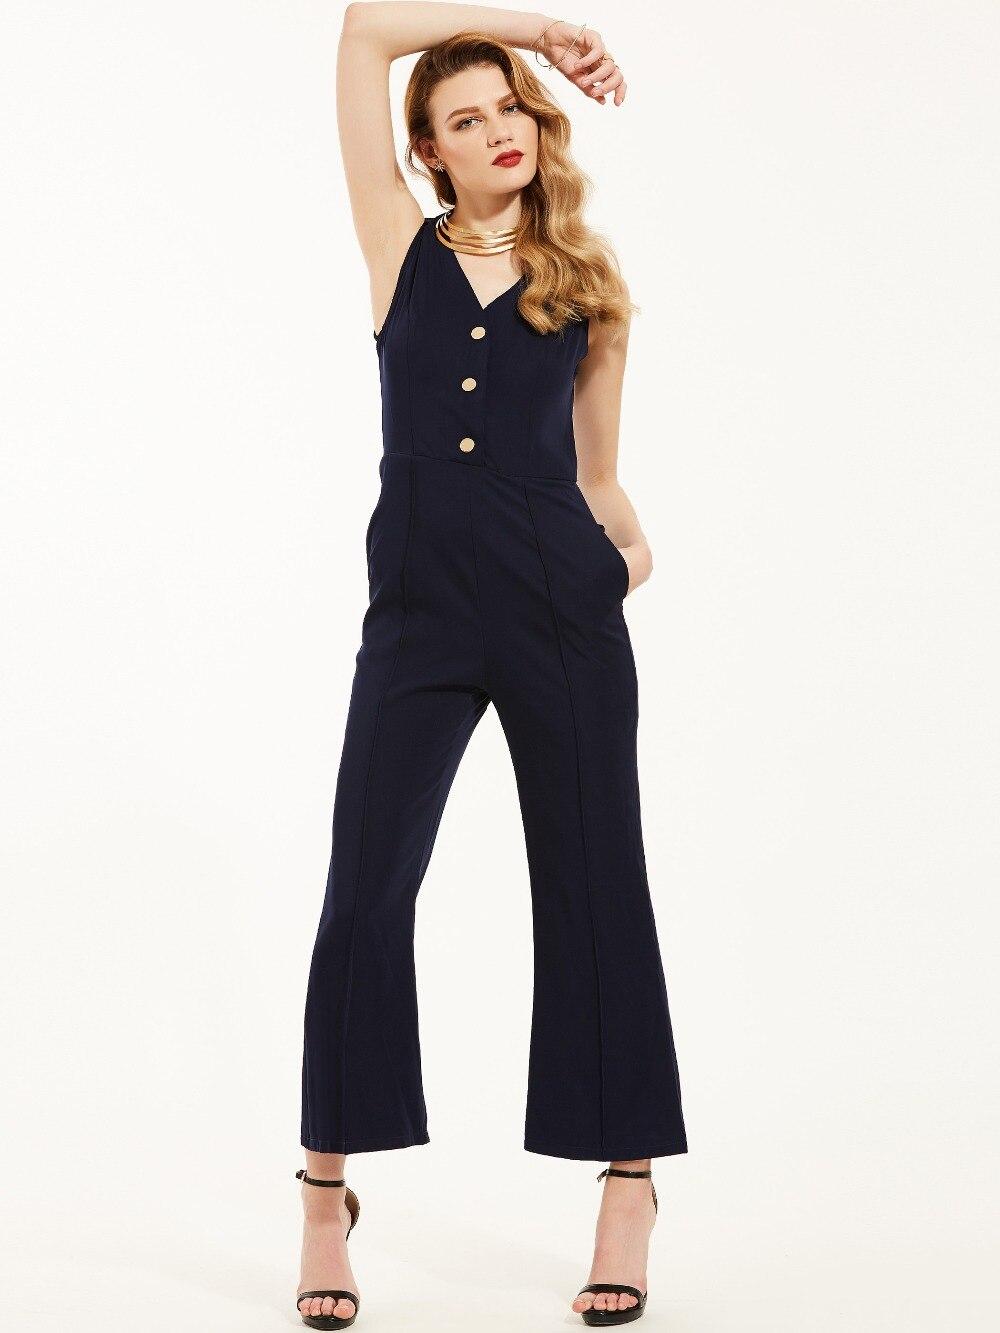 Fashion Office Lady One Piece Jumpsuit Elegant V Neck Button High Waist Wide Legs Pant Sleeveless Romper Women Jumpsuit